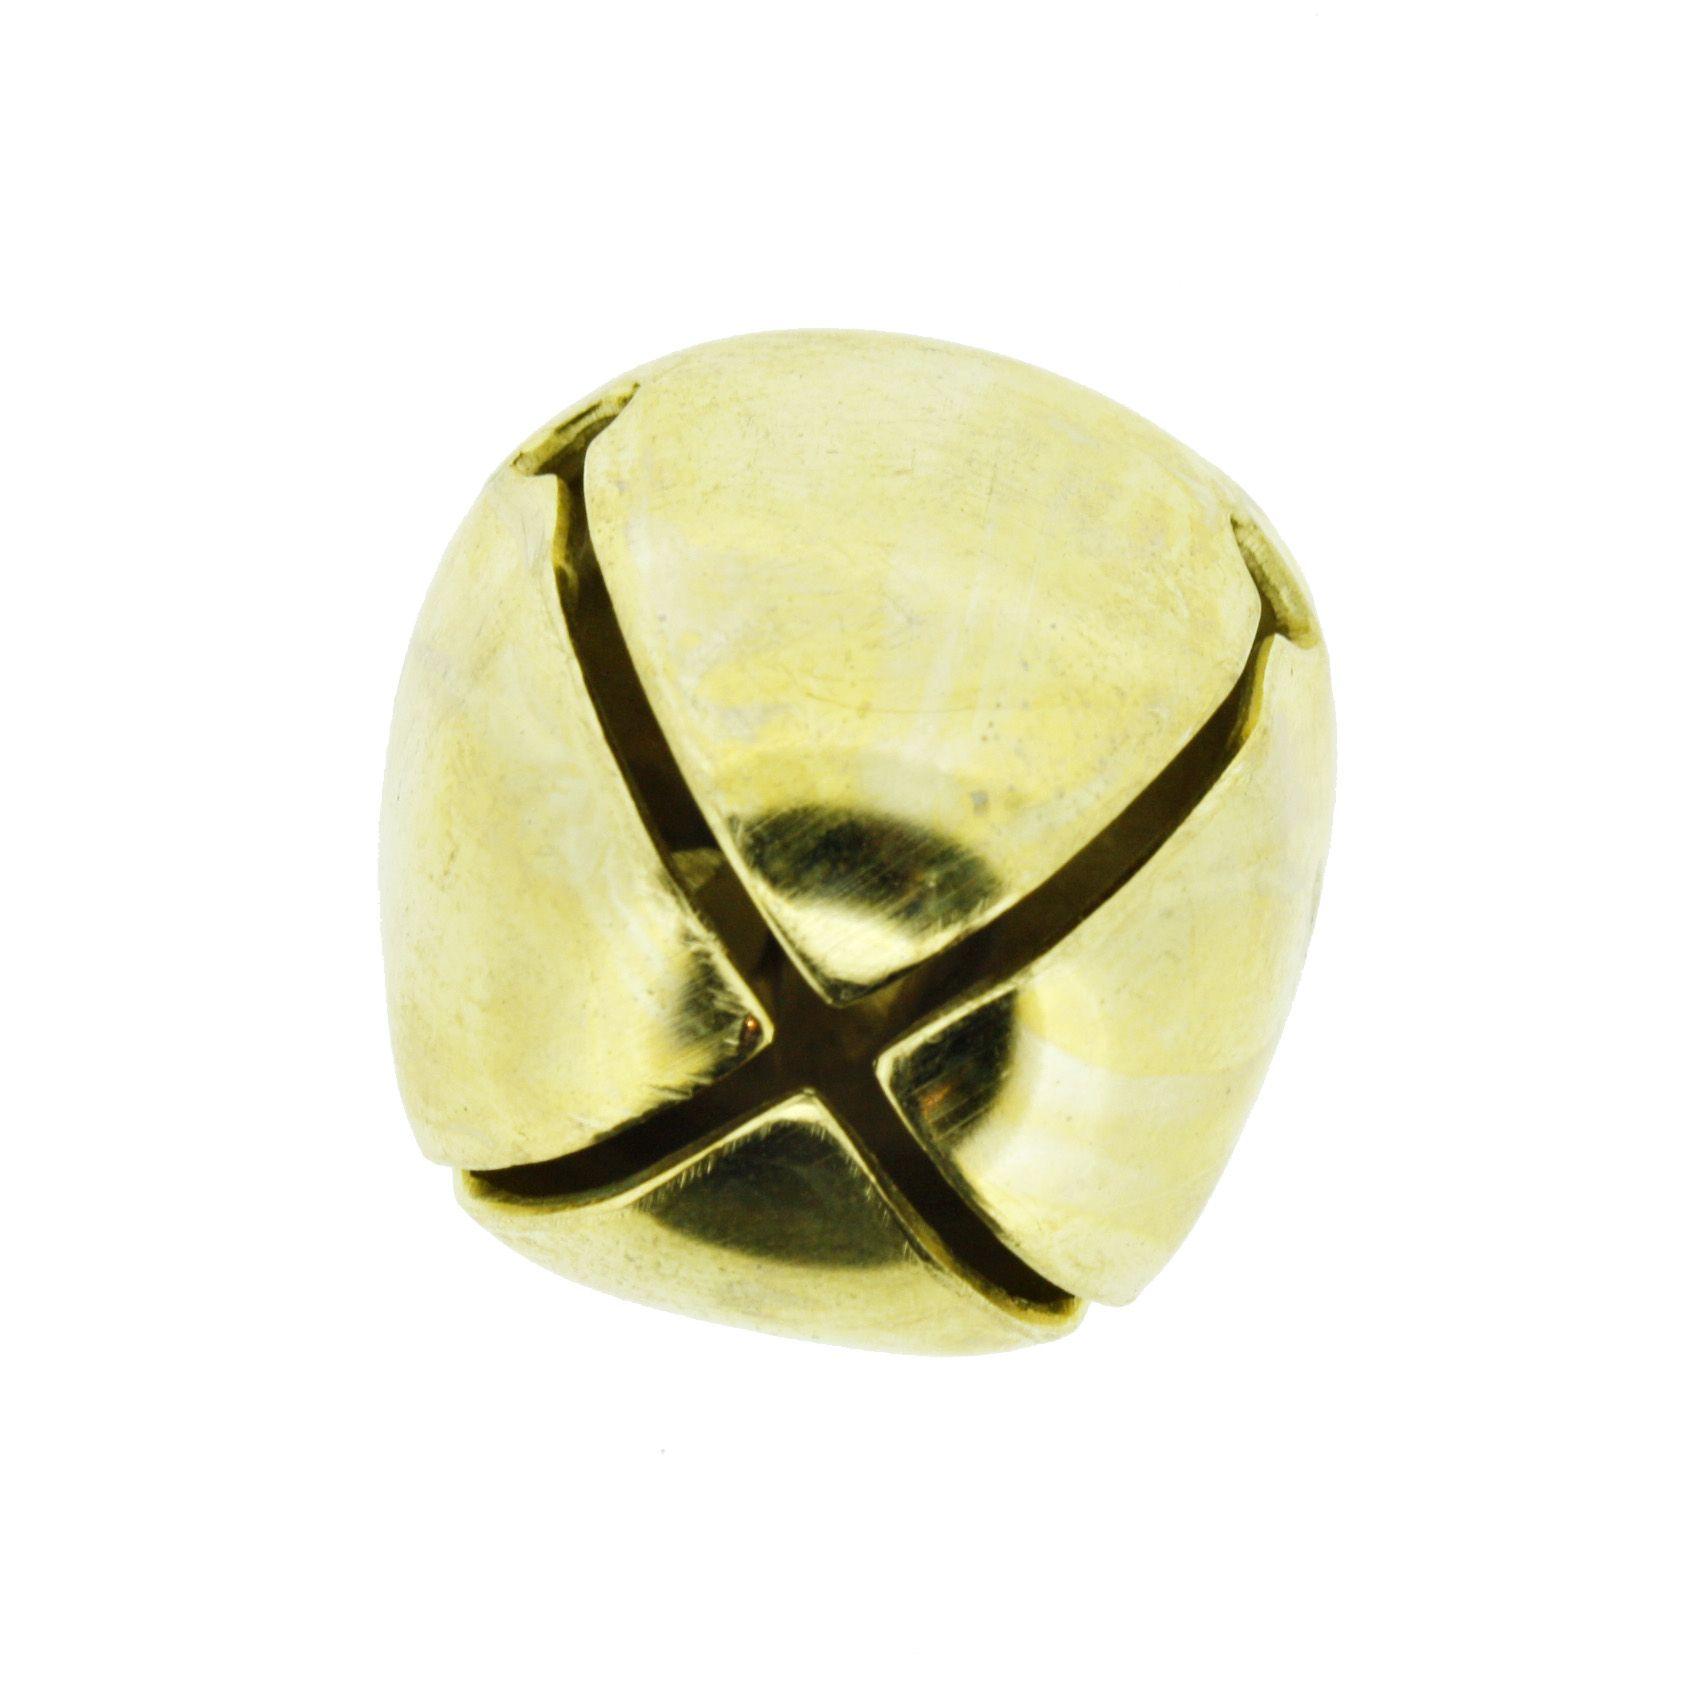 Guizo - Xaôro nº5 - Dourado - 01 peça  - Universo Religioso® - Artigos de Umbanda e Candomblé